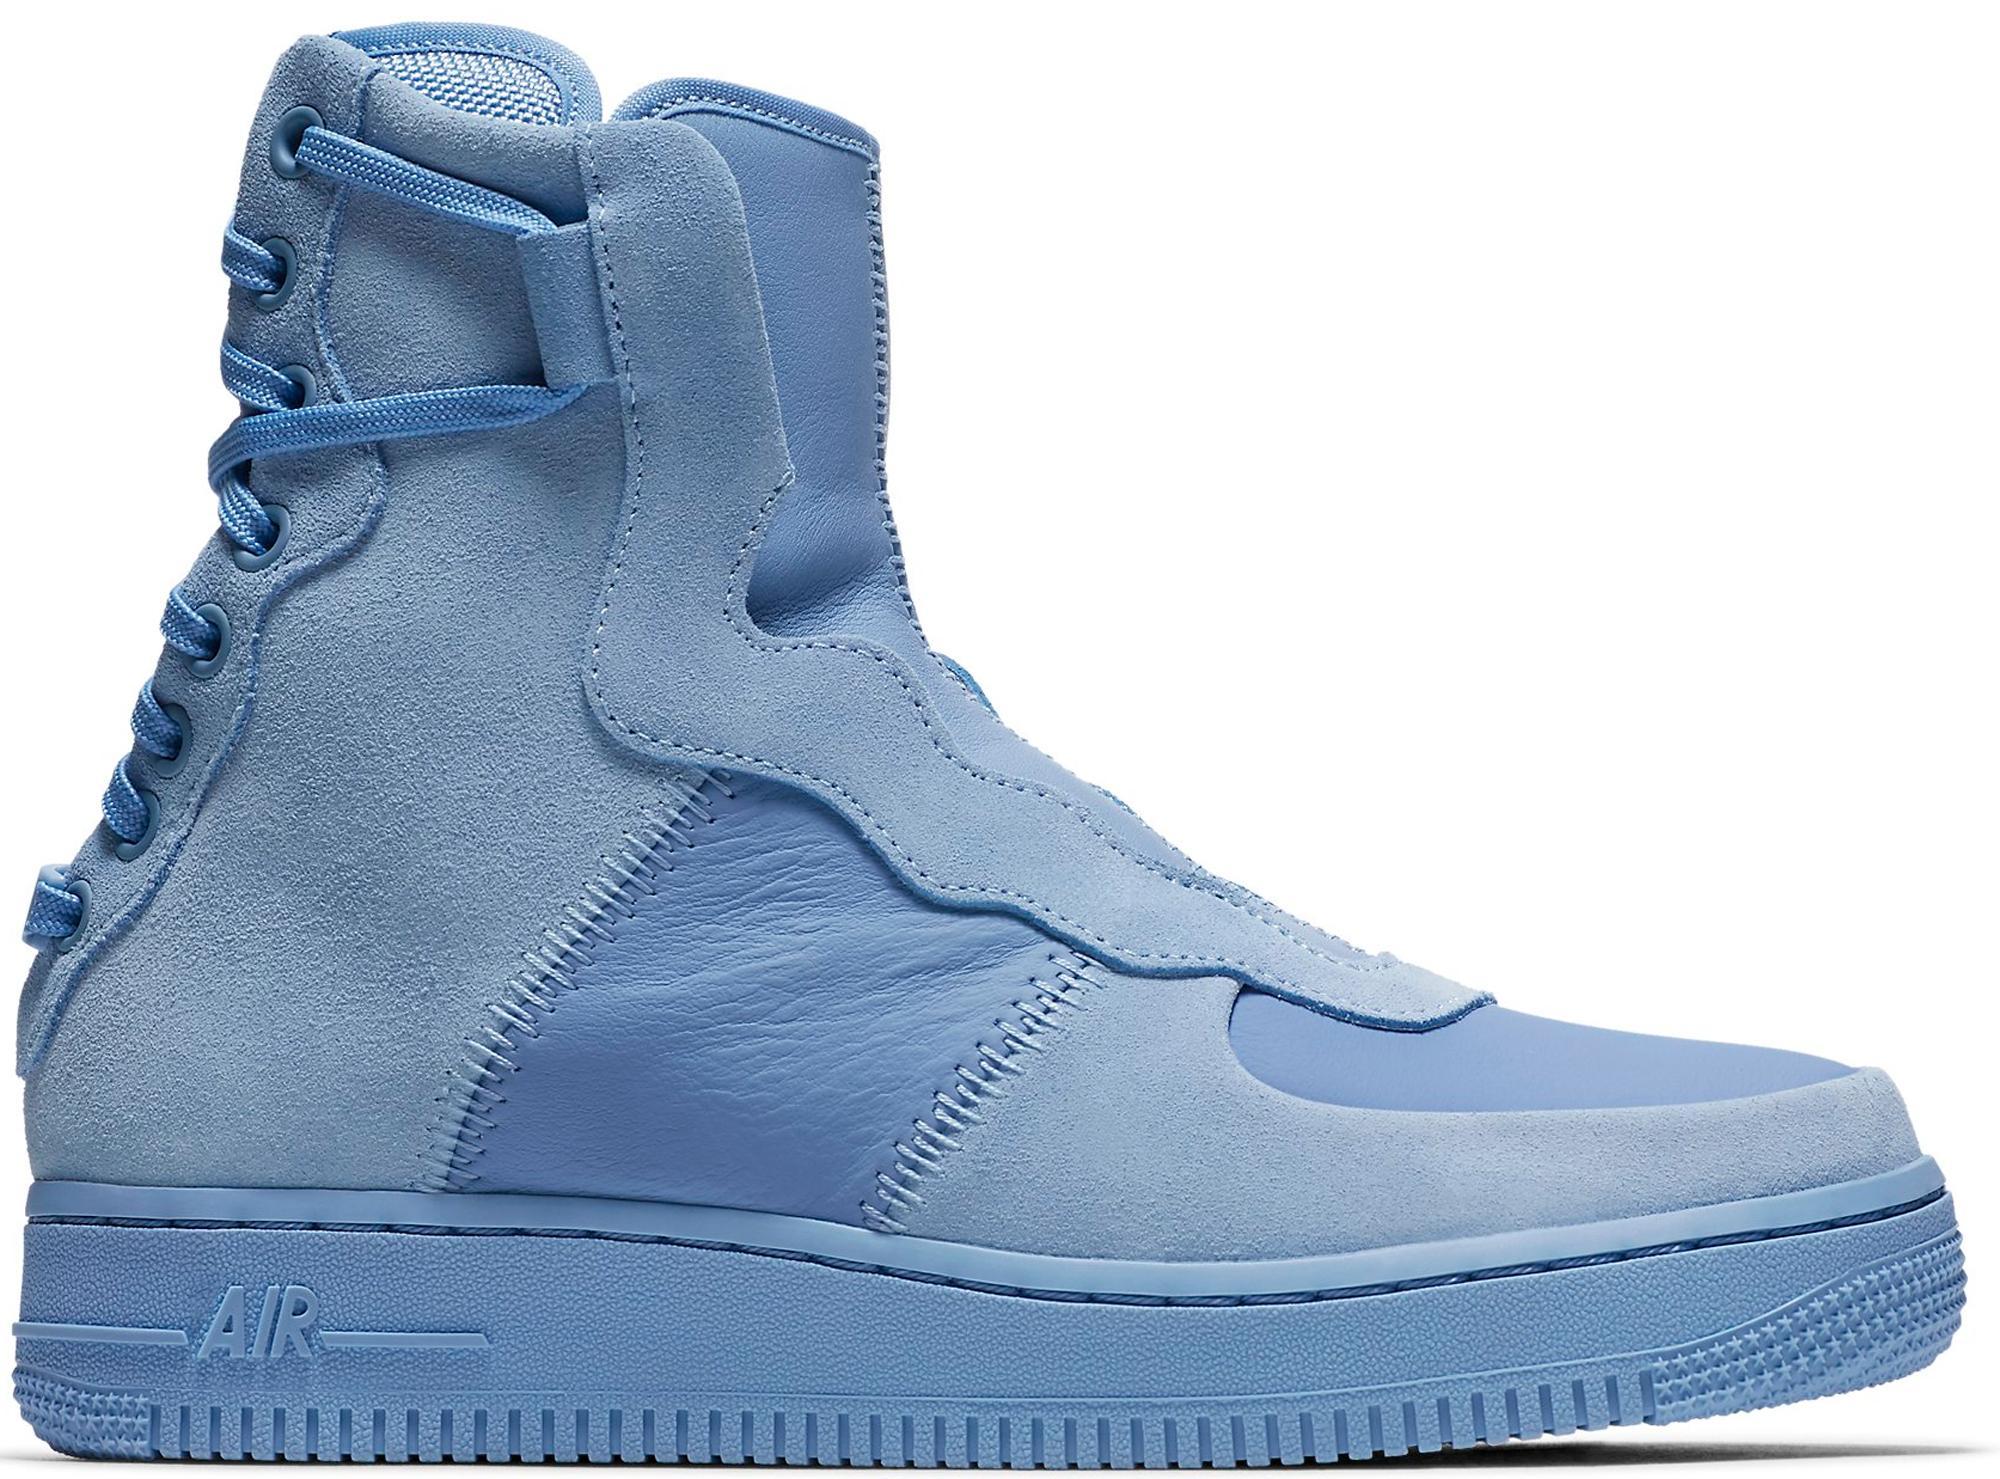 Lago taupo fenómeno Tiranía  Nike Rubber Air Force 1 Rebel Xx High Top Sneaker in Light Blue/Light Blue  (Blue) - Save 37% - Lyst